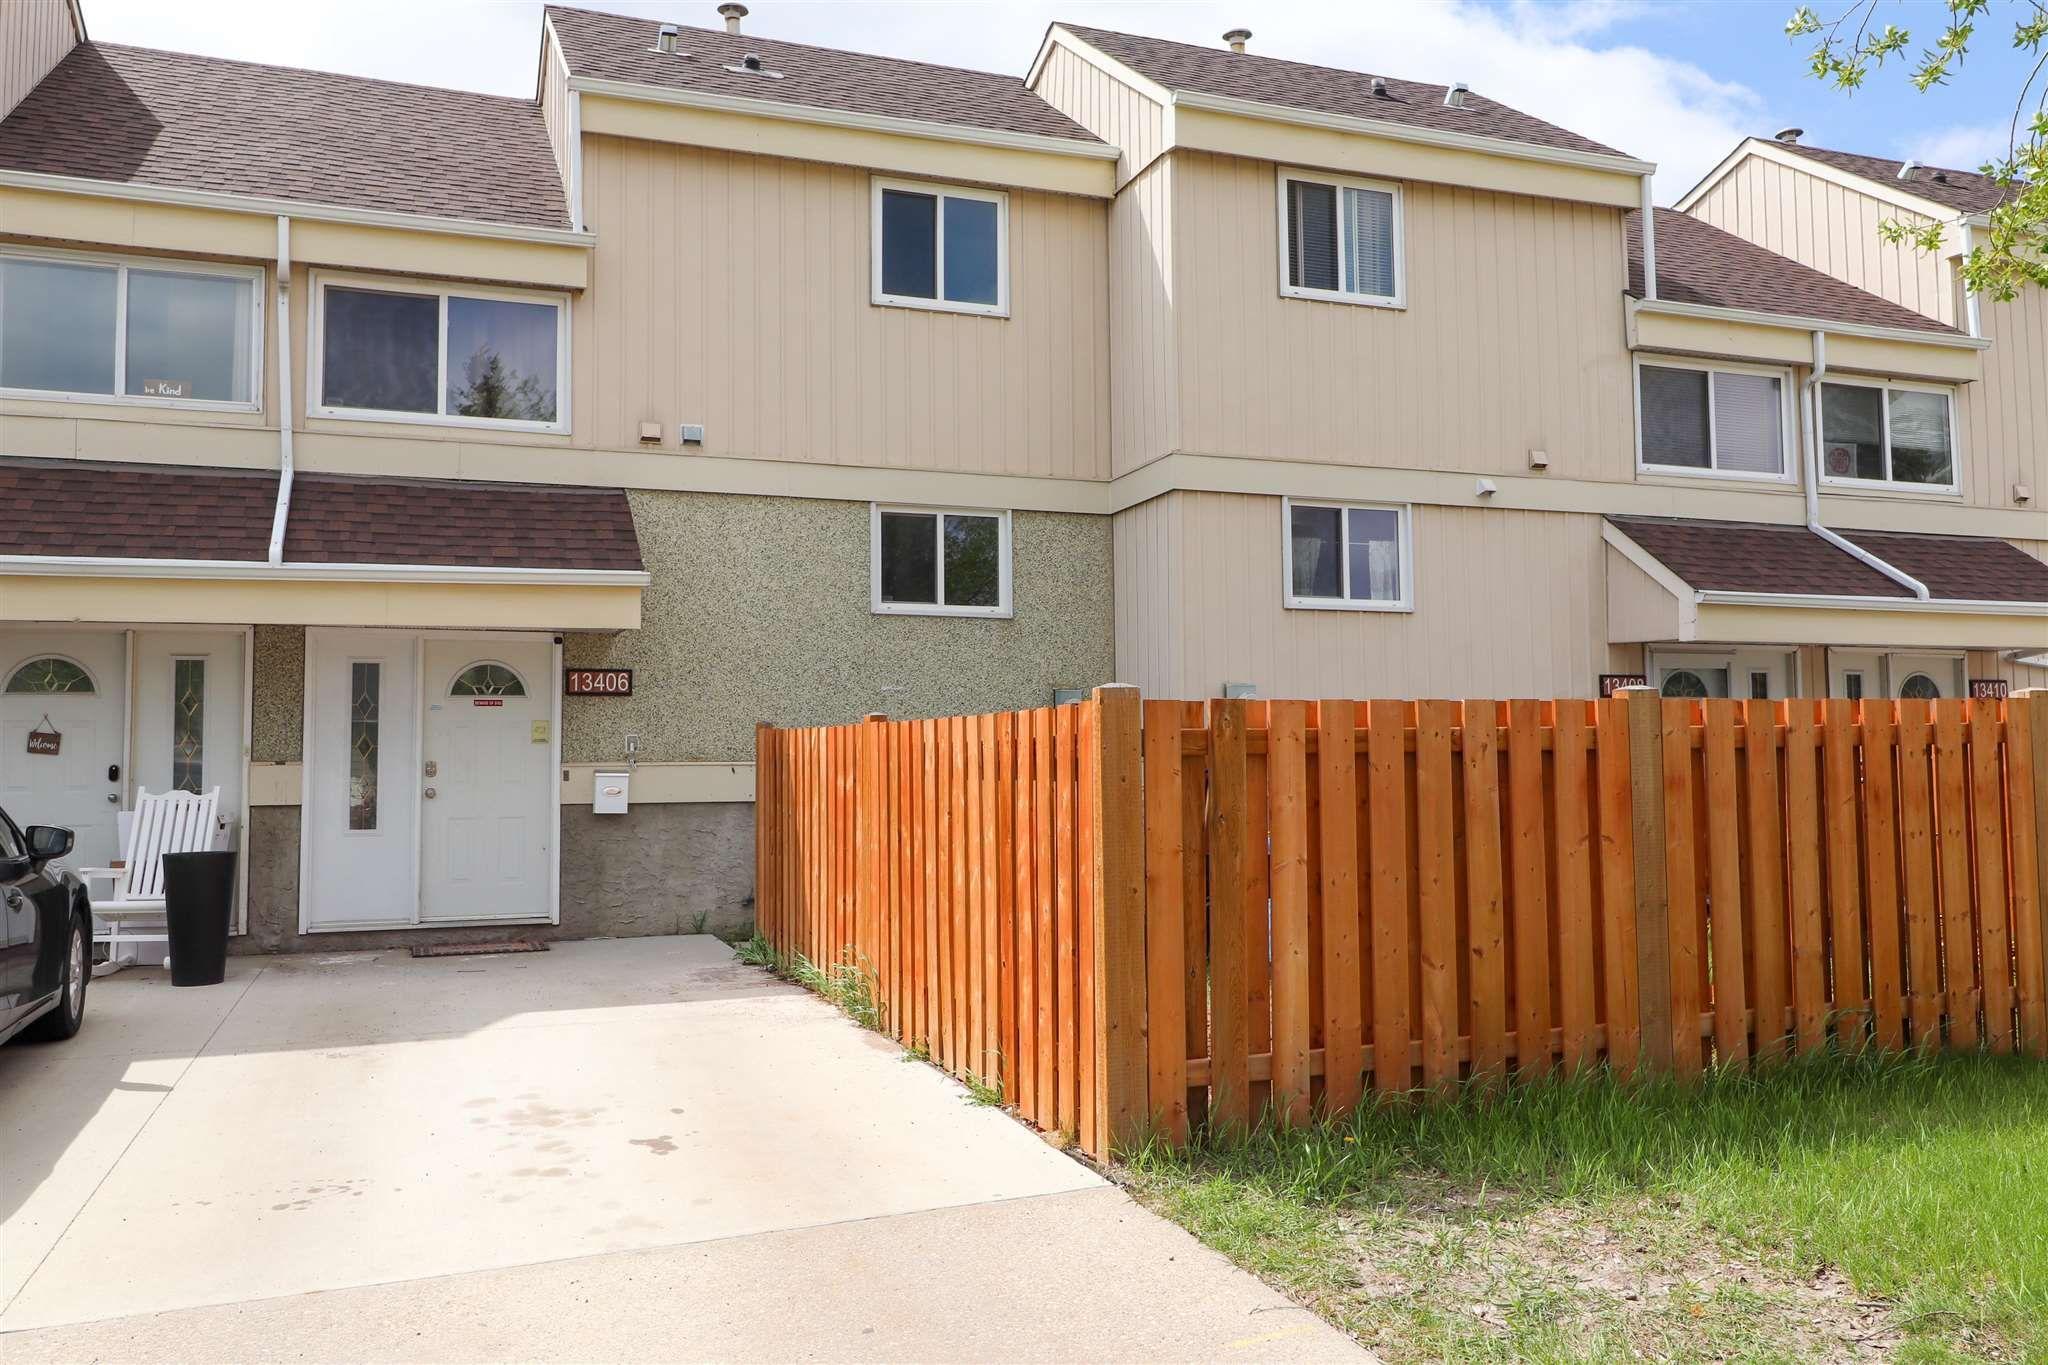 Main Photo: 13406 41 Street in Edmonton: Zone 35 Townhouse for sale : MLS®# E4248400